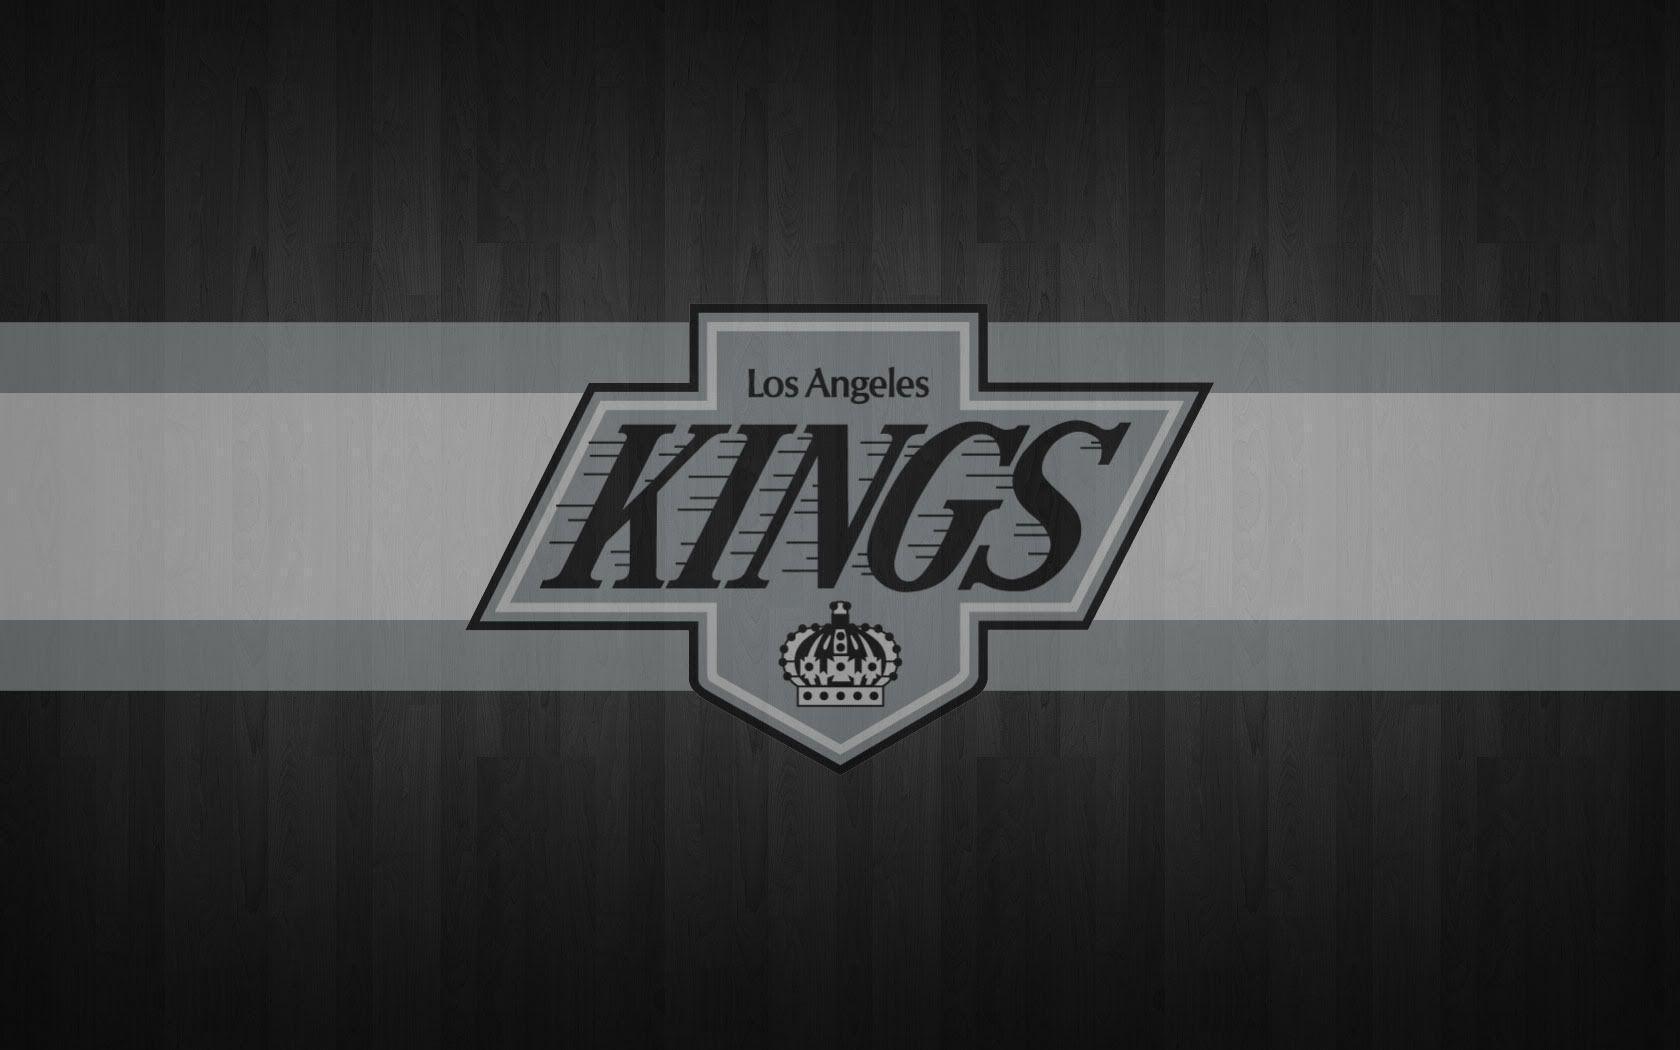 los angeles kings wallpapers - wallpaper cave